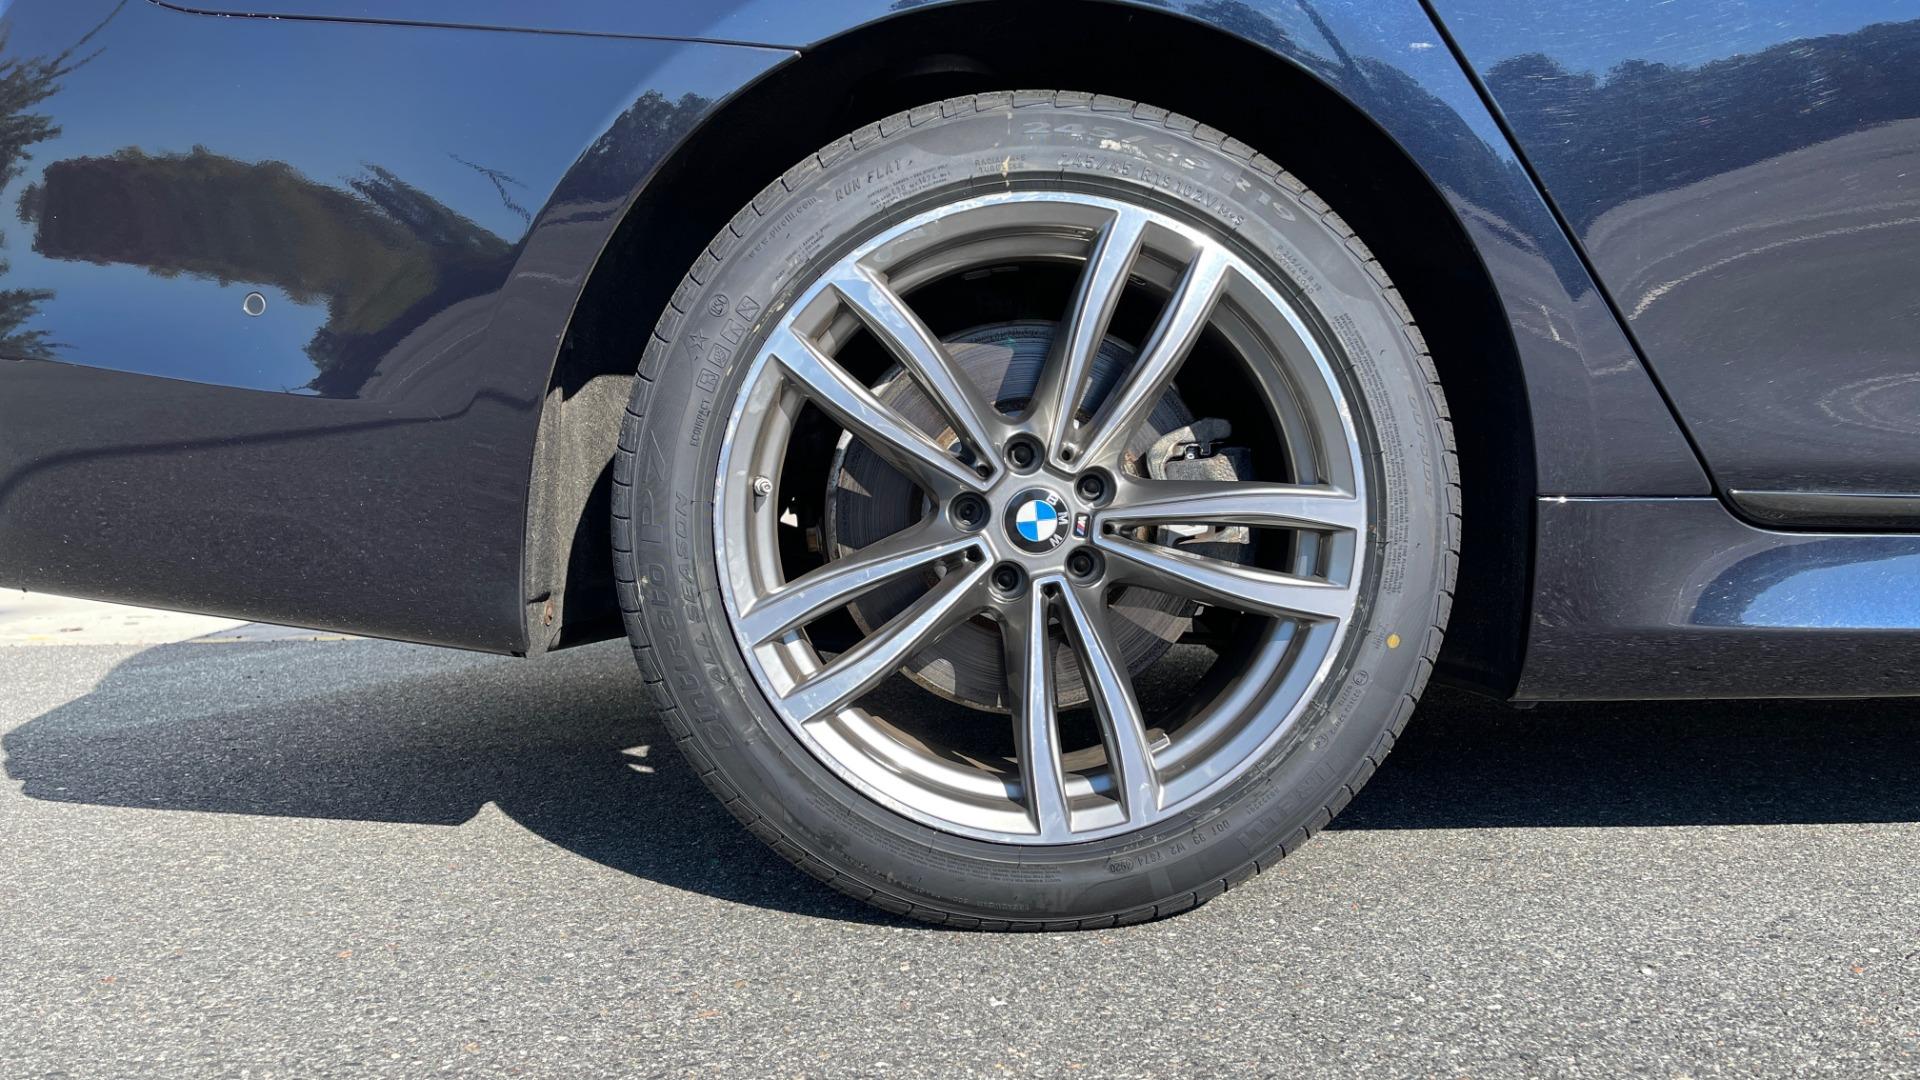 Used 2019 BMW 7 SERIES 750I XDRIVE M-SPORT / EXEC PKG / DRVR ASST PLUS / CLD WTHR / PAR for sale $60,995 at Formula Imports in Charlotte NC 28227 59